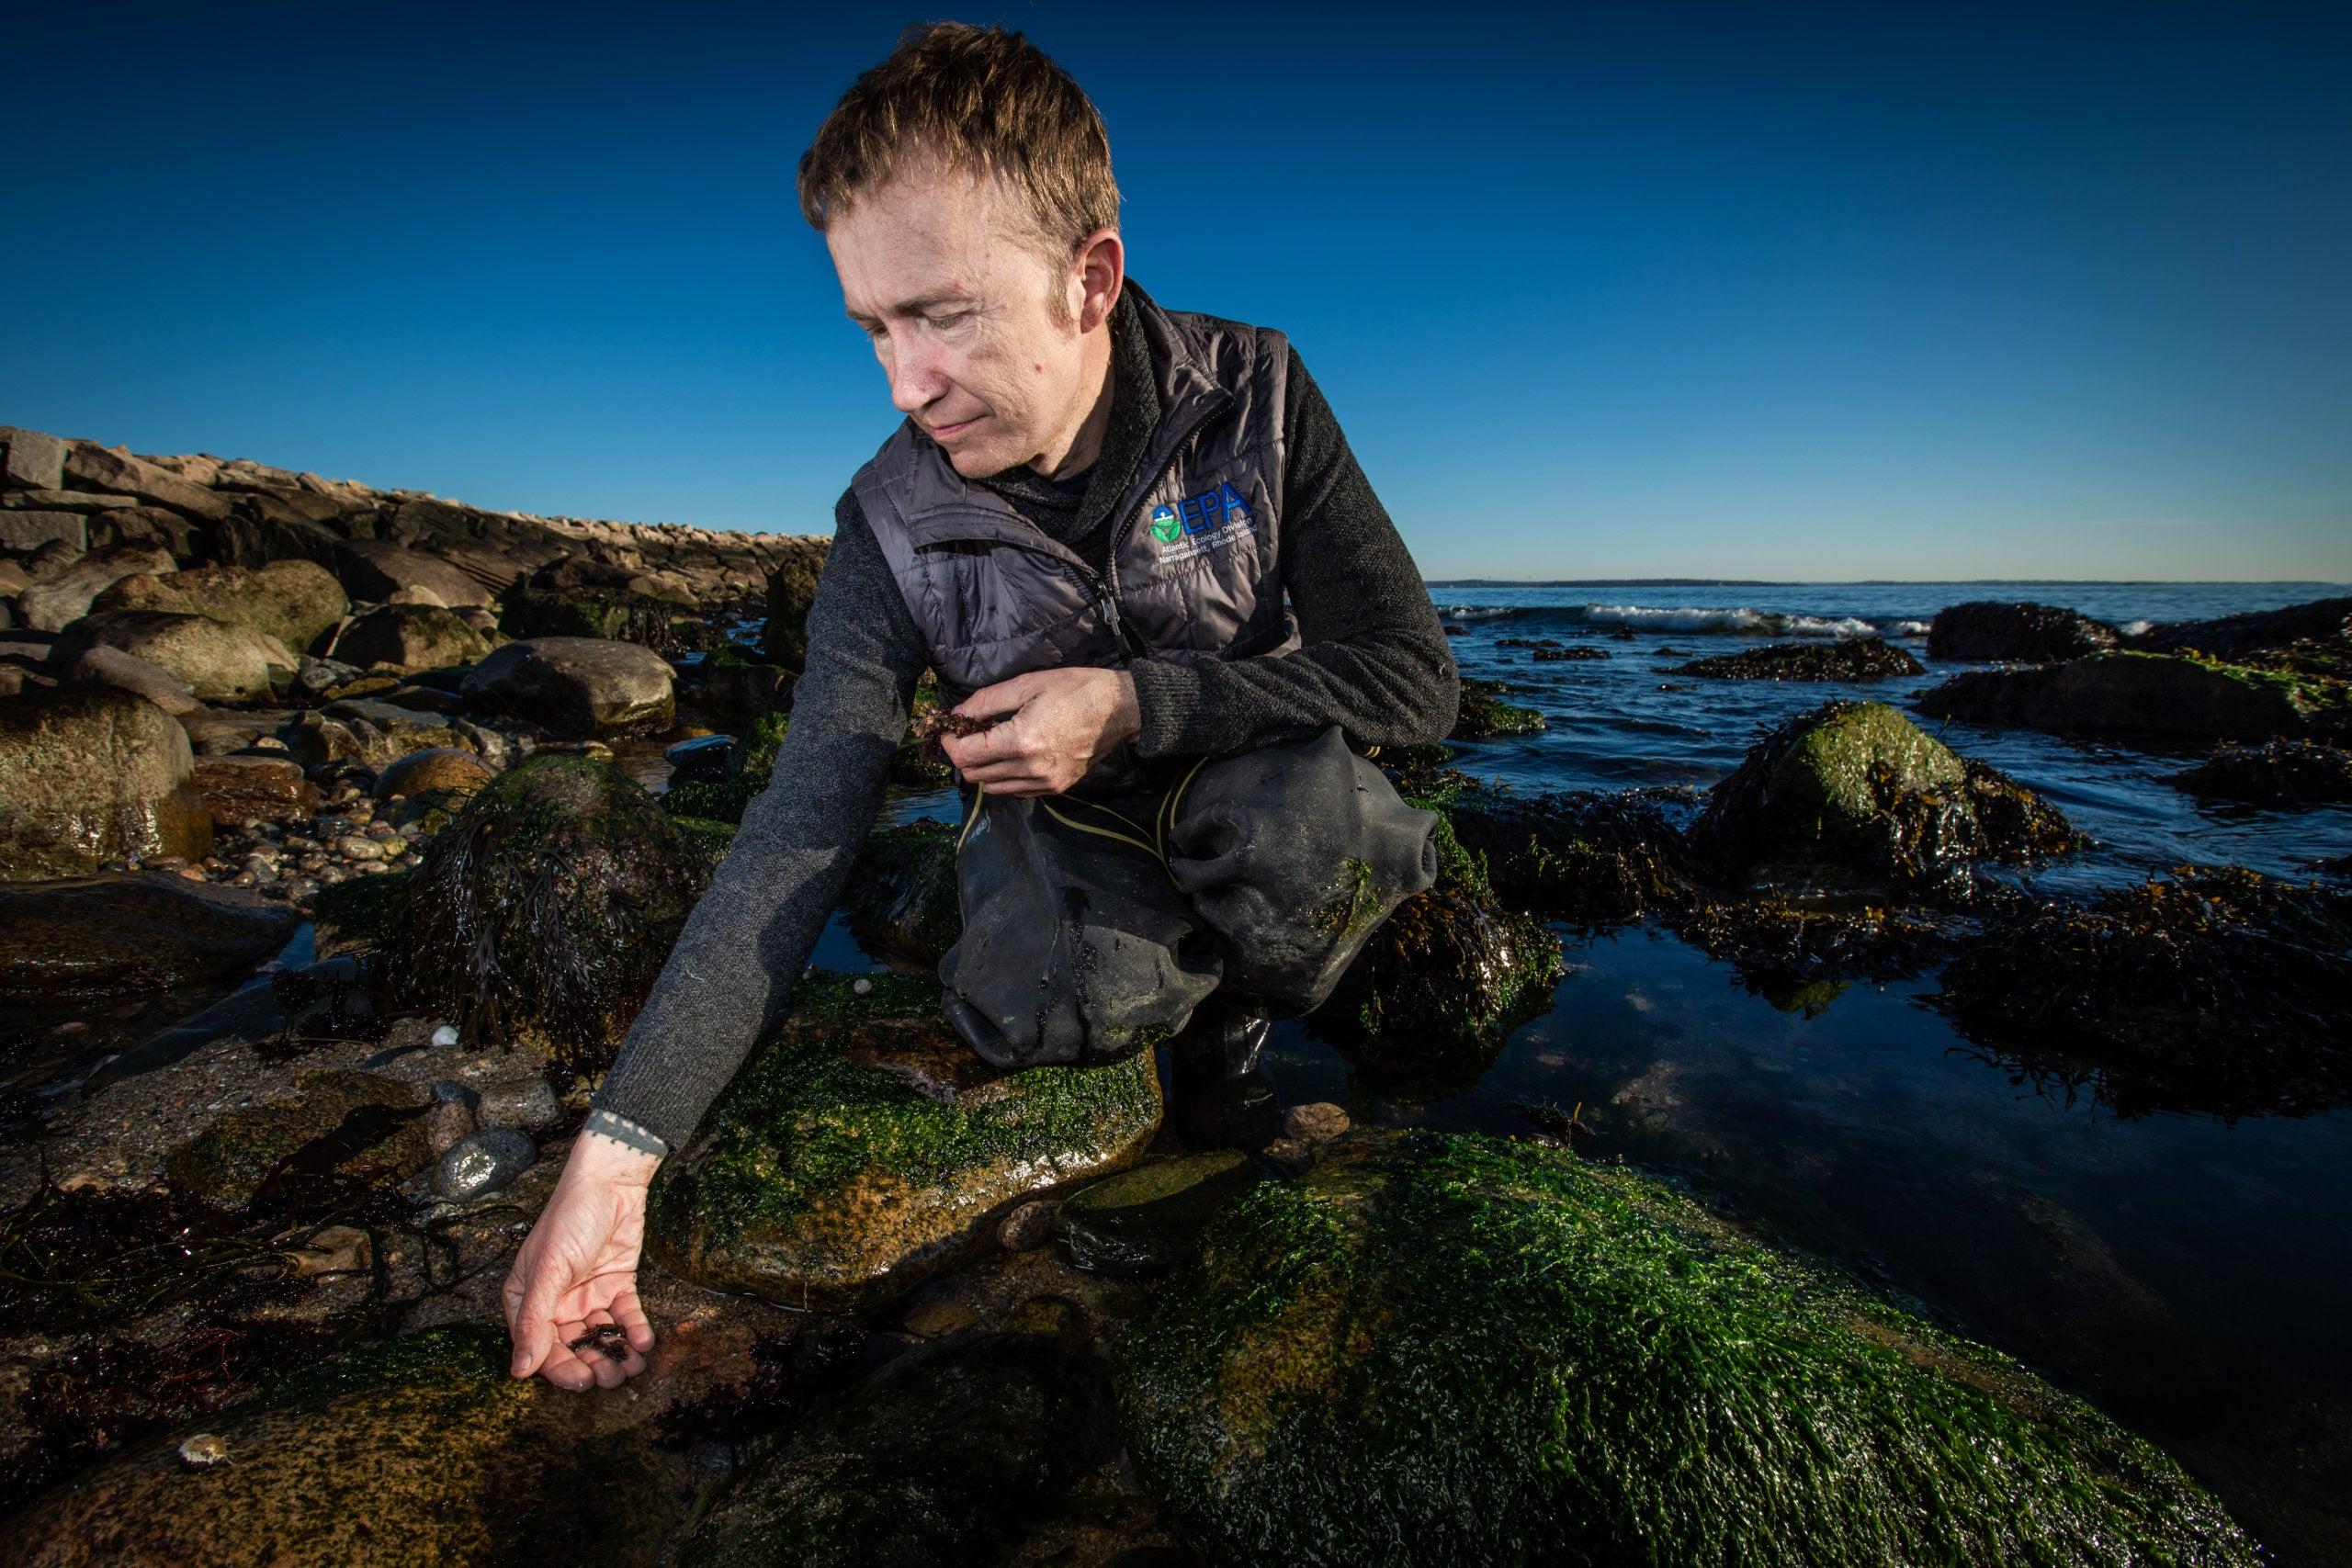 Niels Hobbs holds several Asian shore crabs along the shoreline